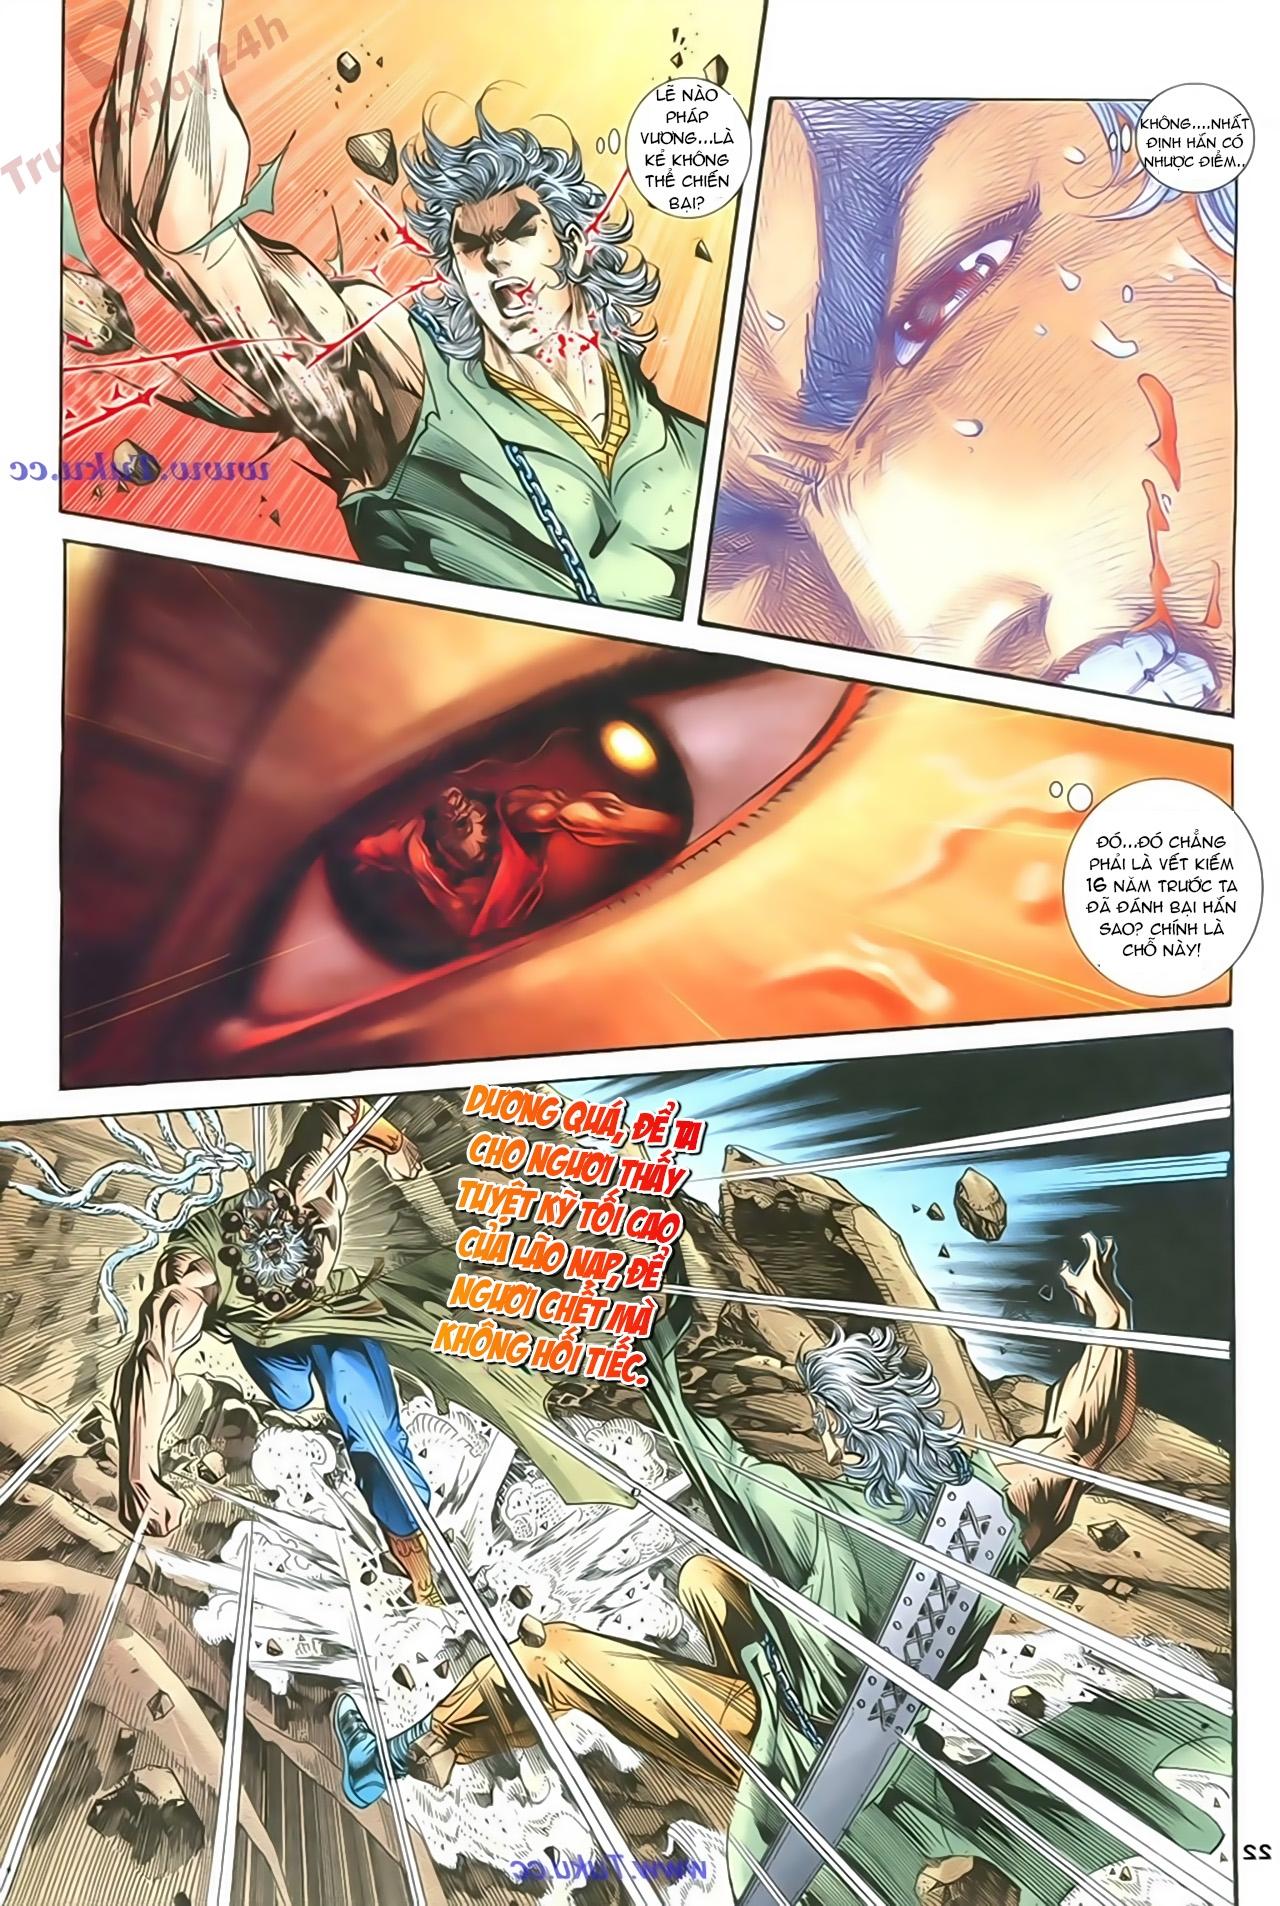 Thần Điêu Hiệp Lữ chap 86 – End Trang 22 - Mangak.info